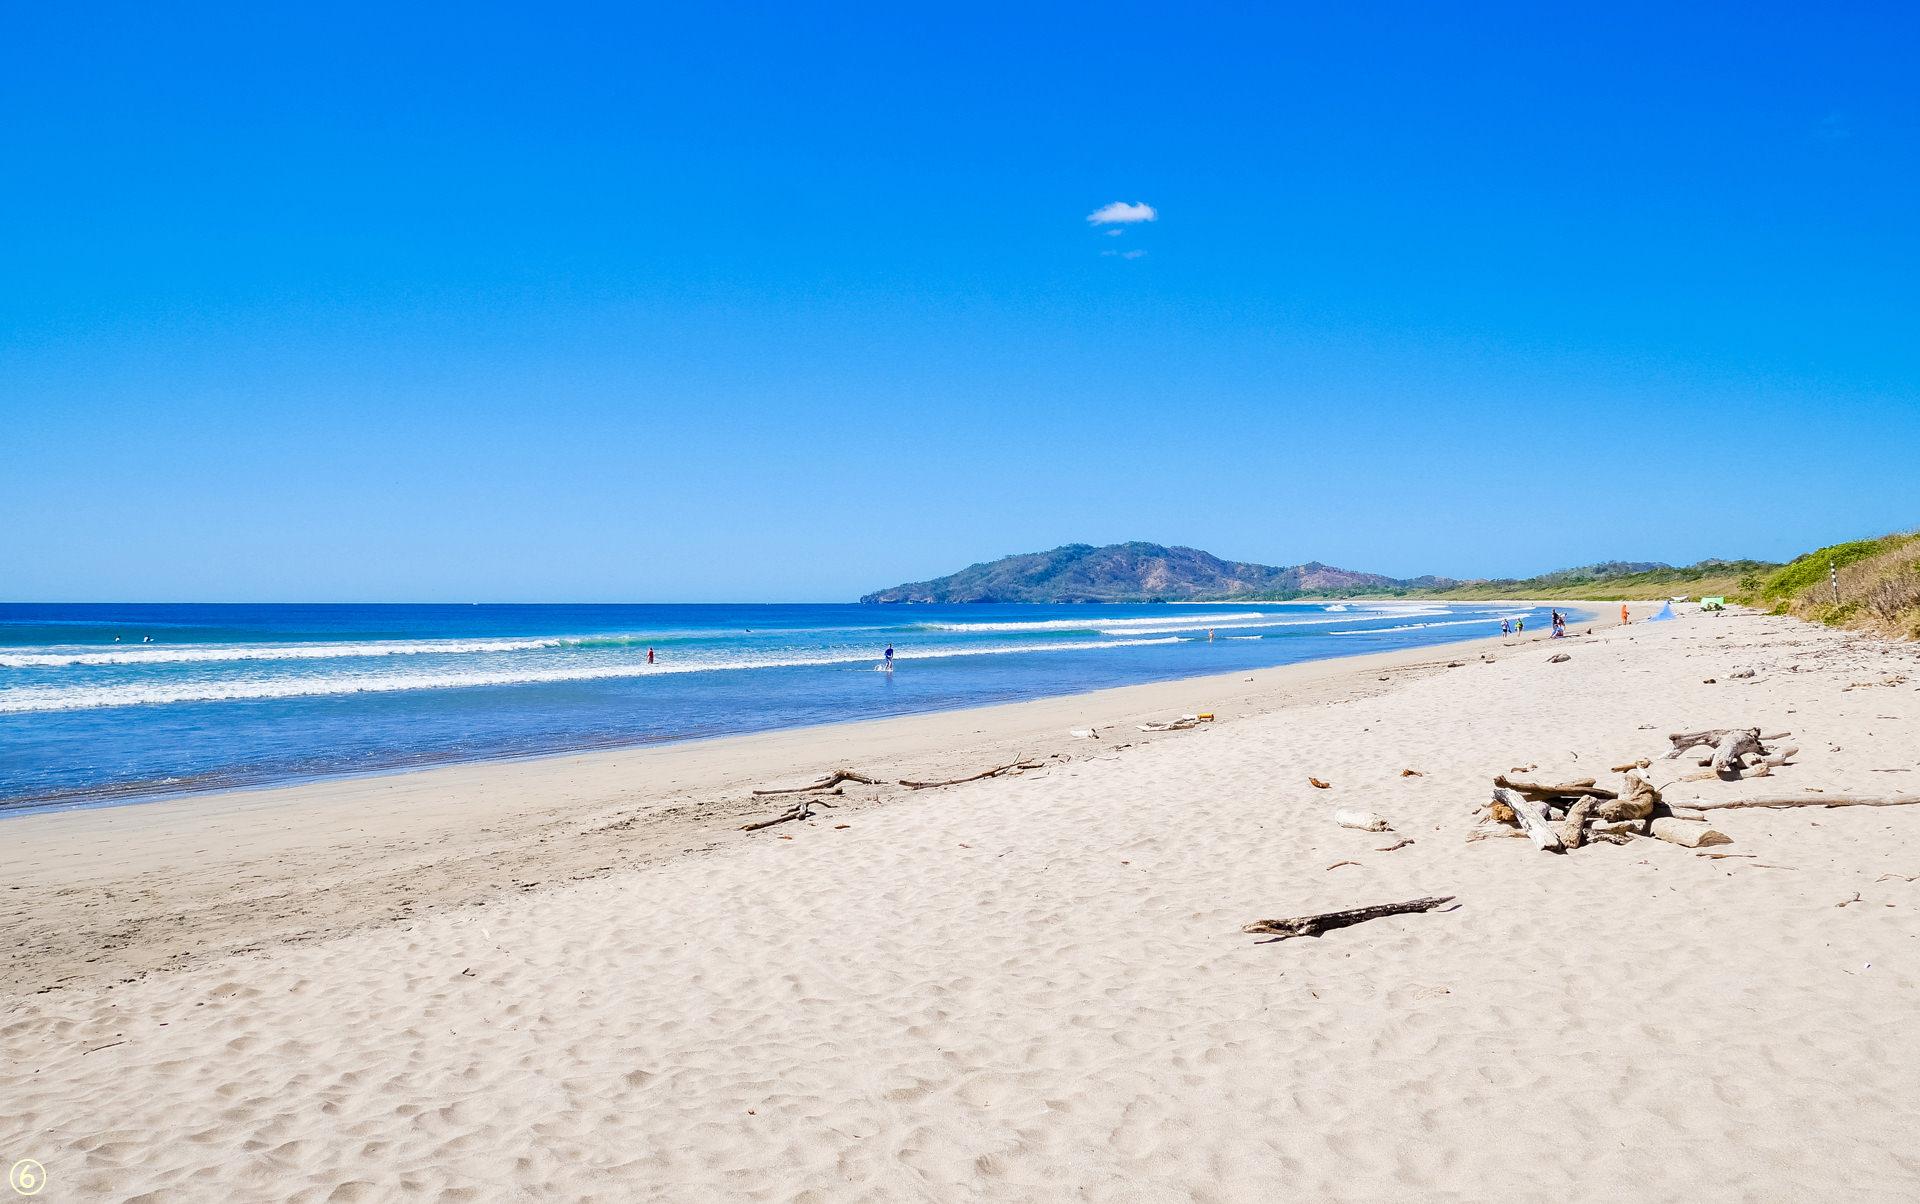 playa grande beach guanacaste costa rica